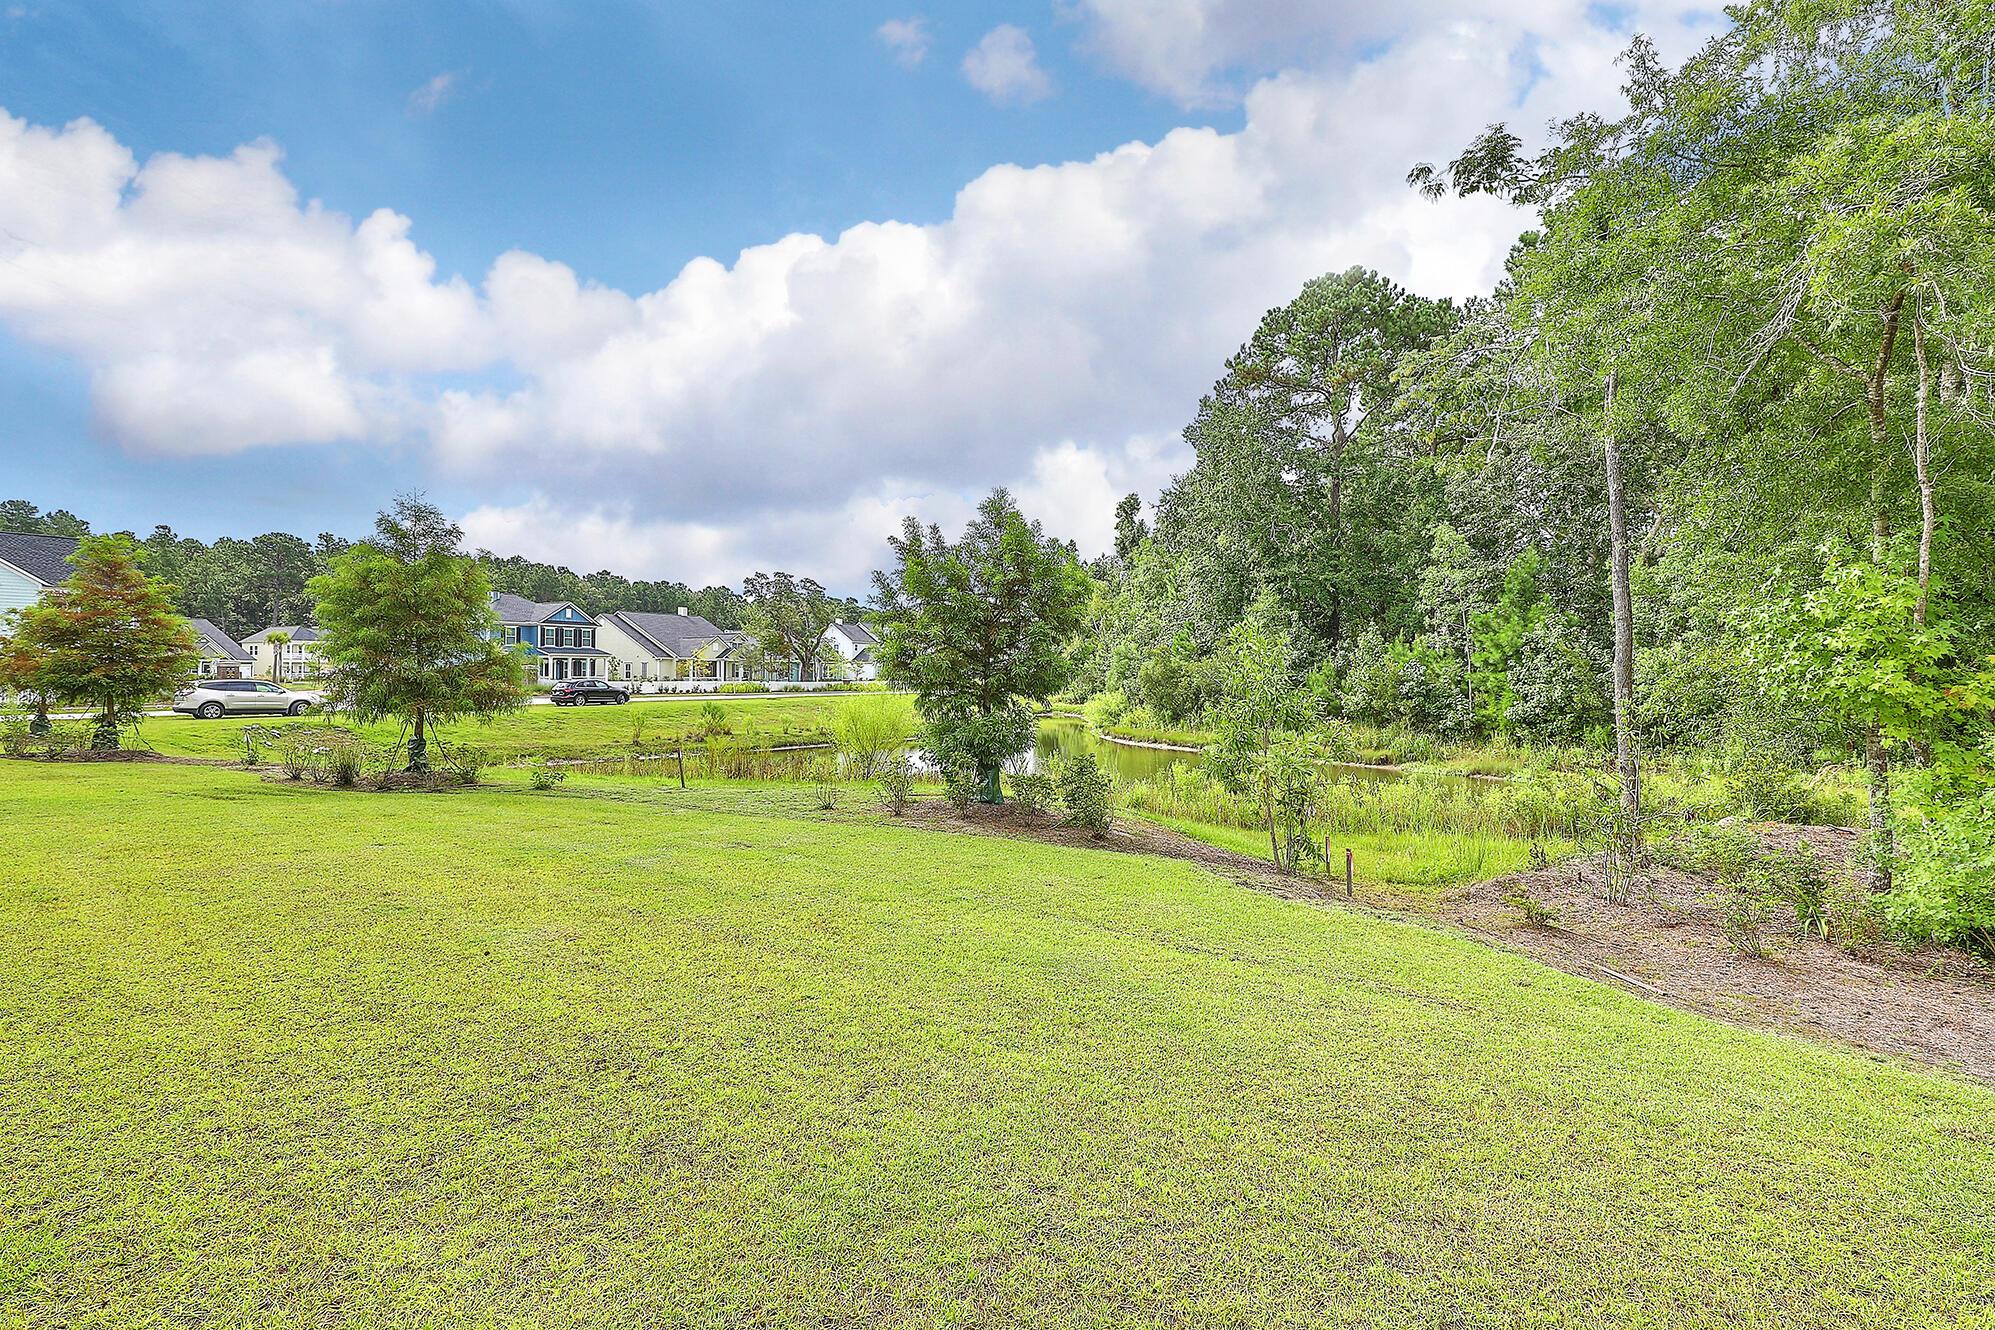 Park West Homes For Sale - 1548 Moss Spring, Mount Pleasant, SC - 9